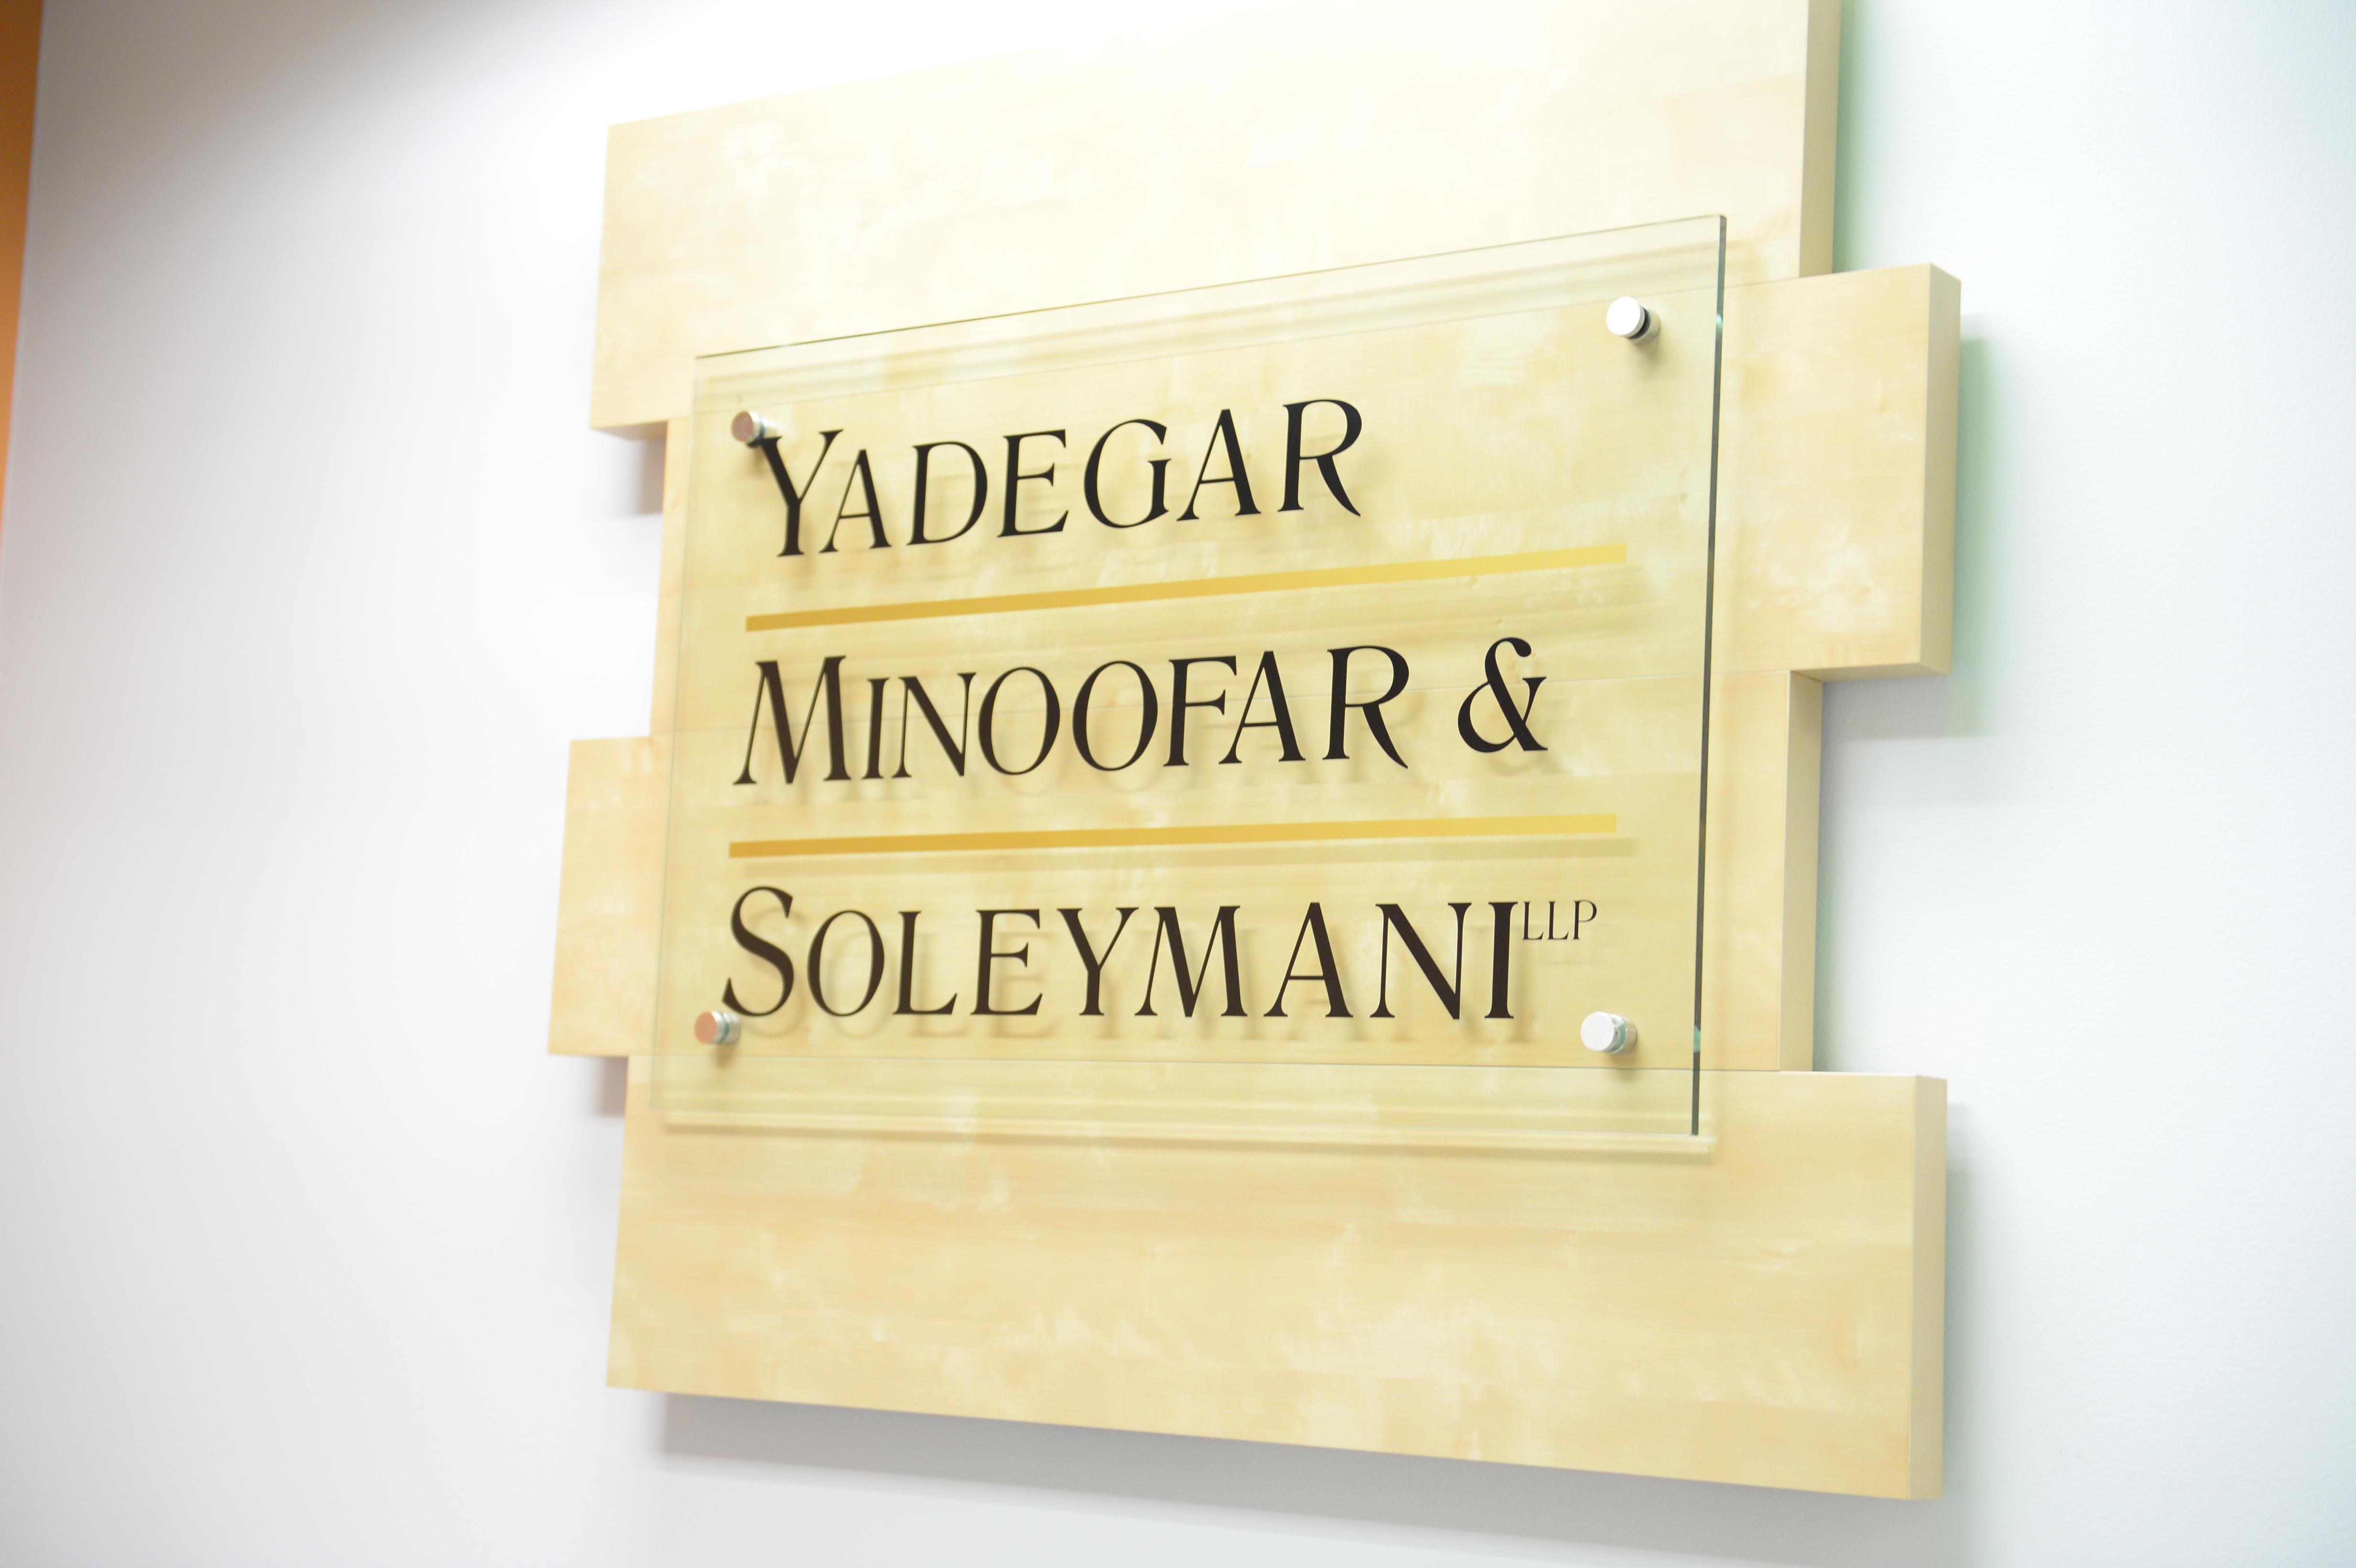 Yadegar, Minoofar & Soleymani - ad image